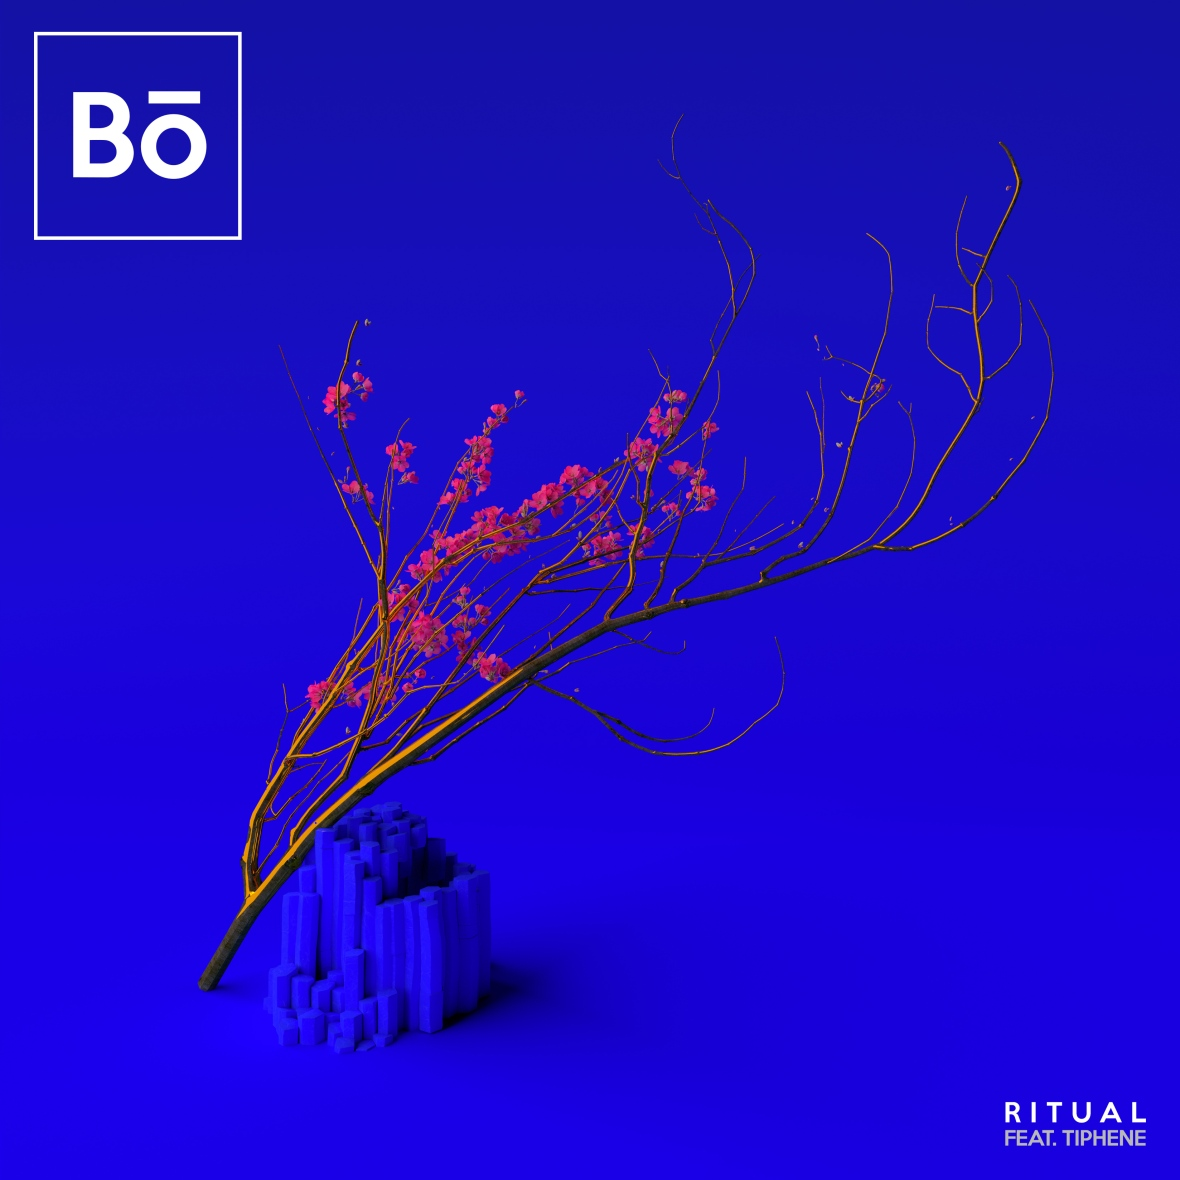 Bō - Ritual ft. Tiphene